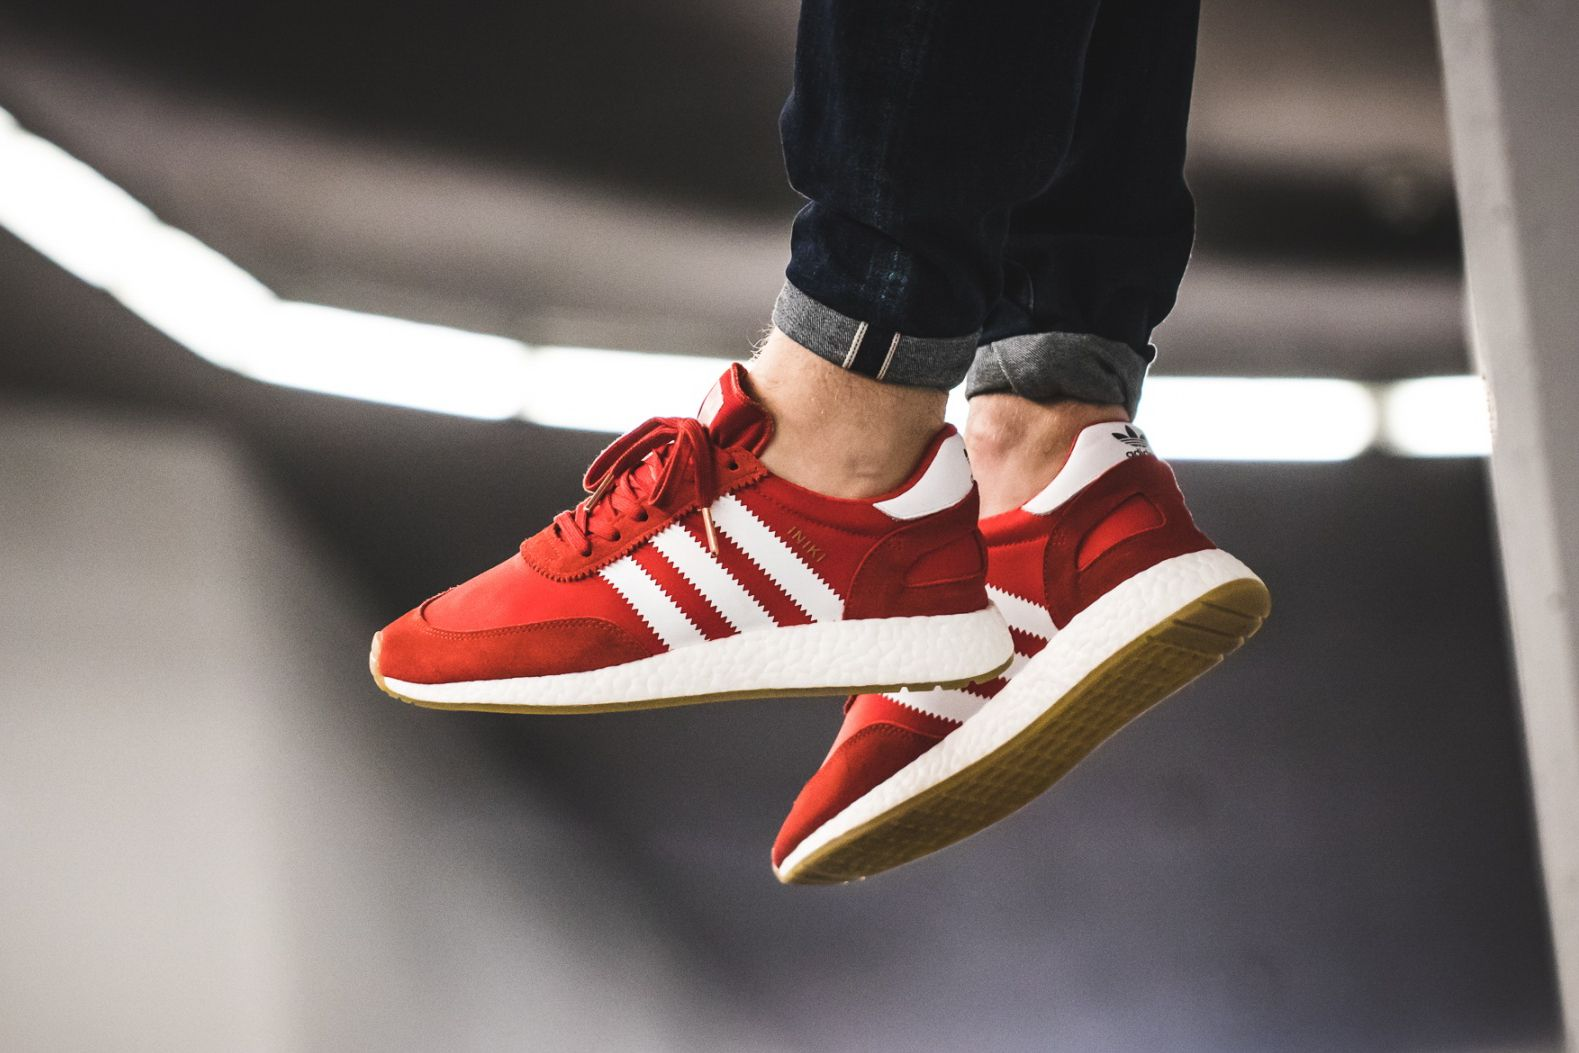 4787519cbdde51 Adidas Iniki Runner On Feet  adidas  adidasinikirunner  trainers  sneakers